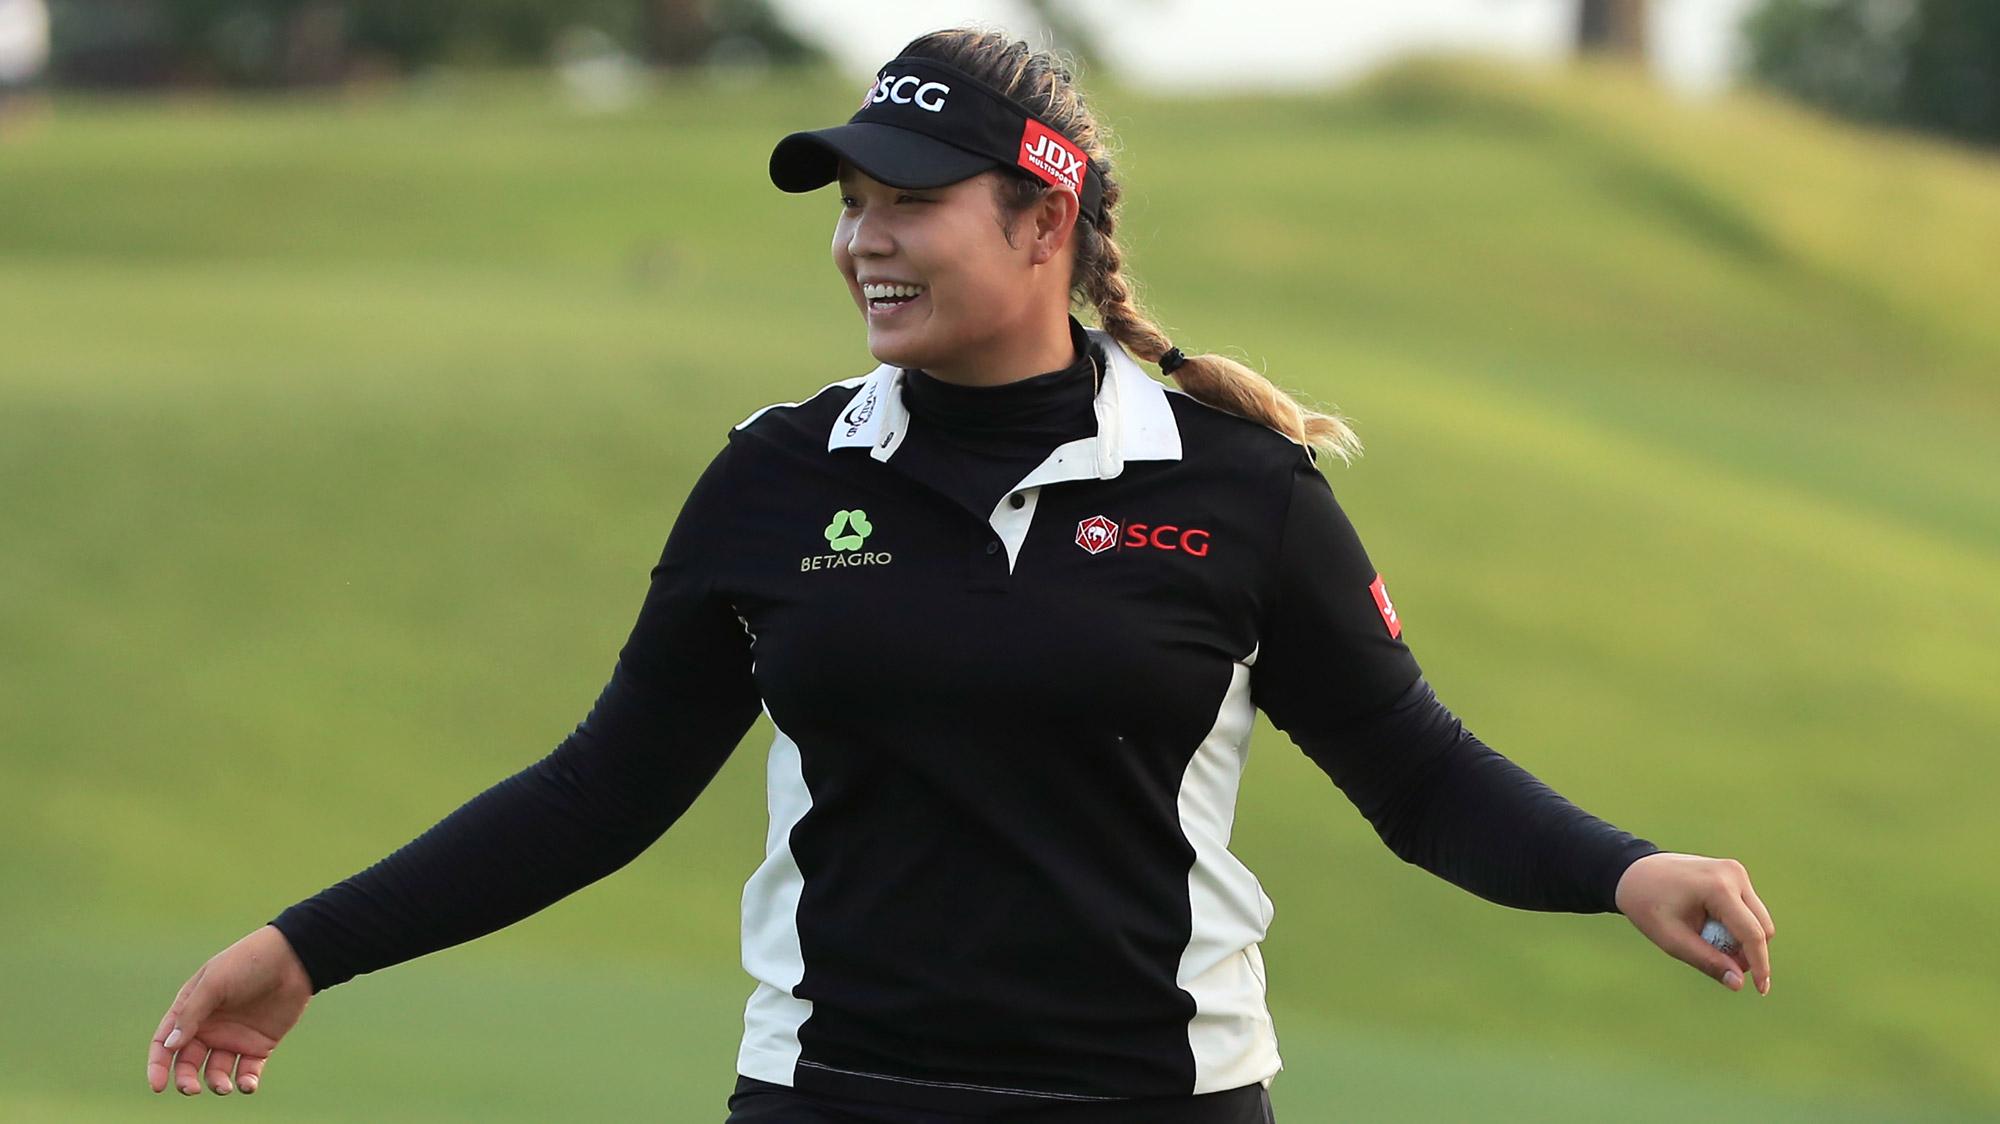 2019 Things to Know Pure Silk Championship | LPGA | Ladies Professional Golf Association